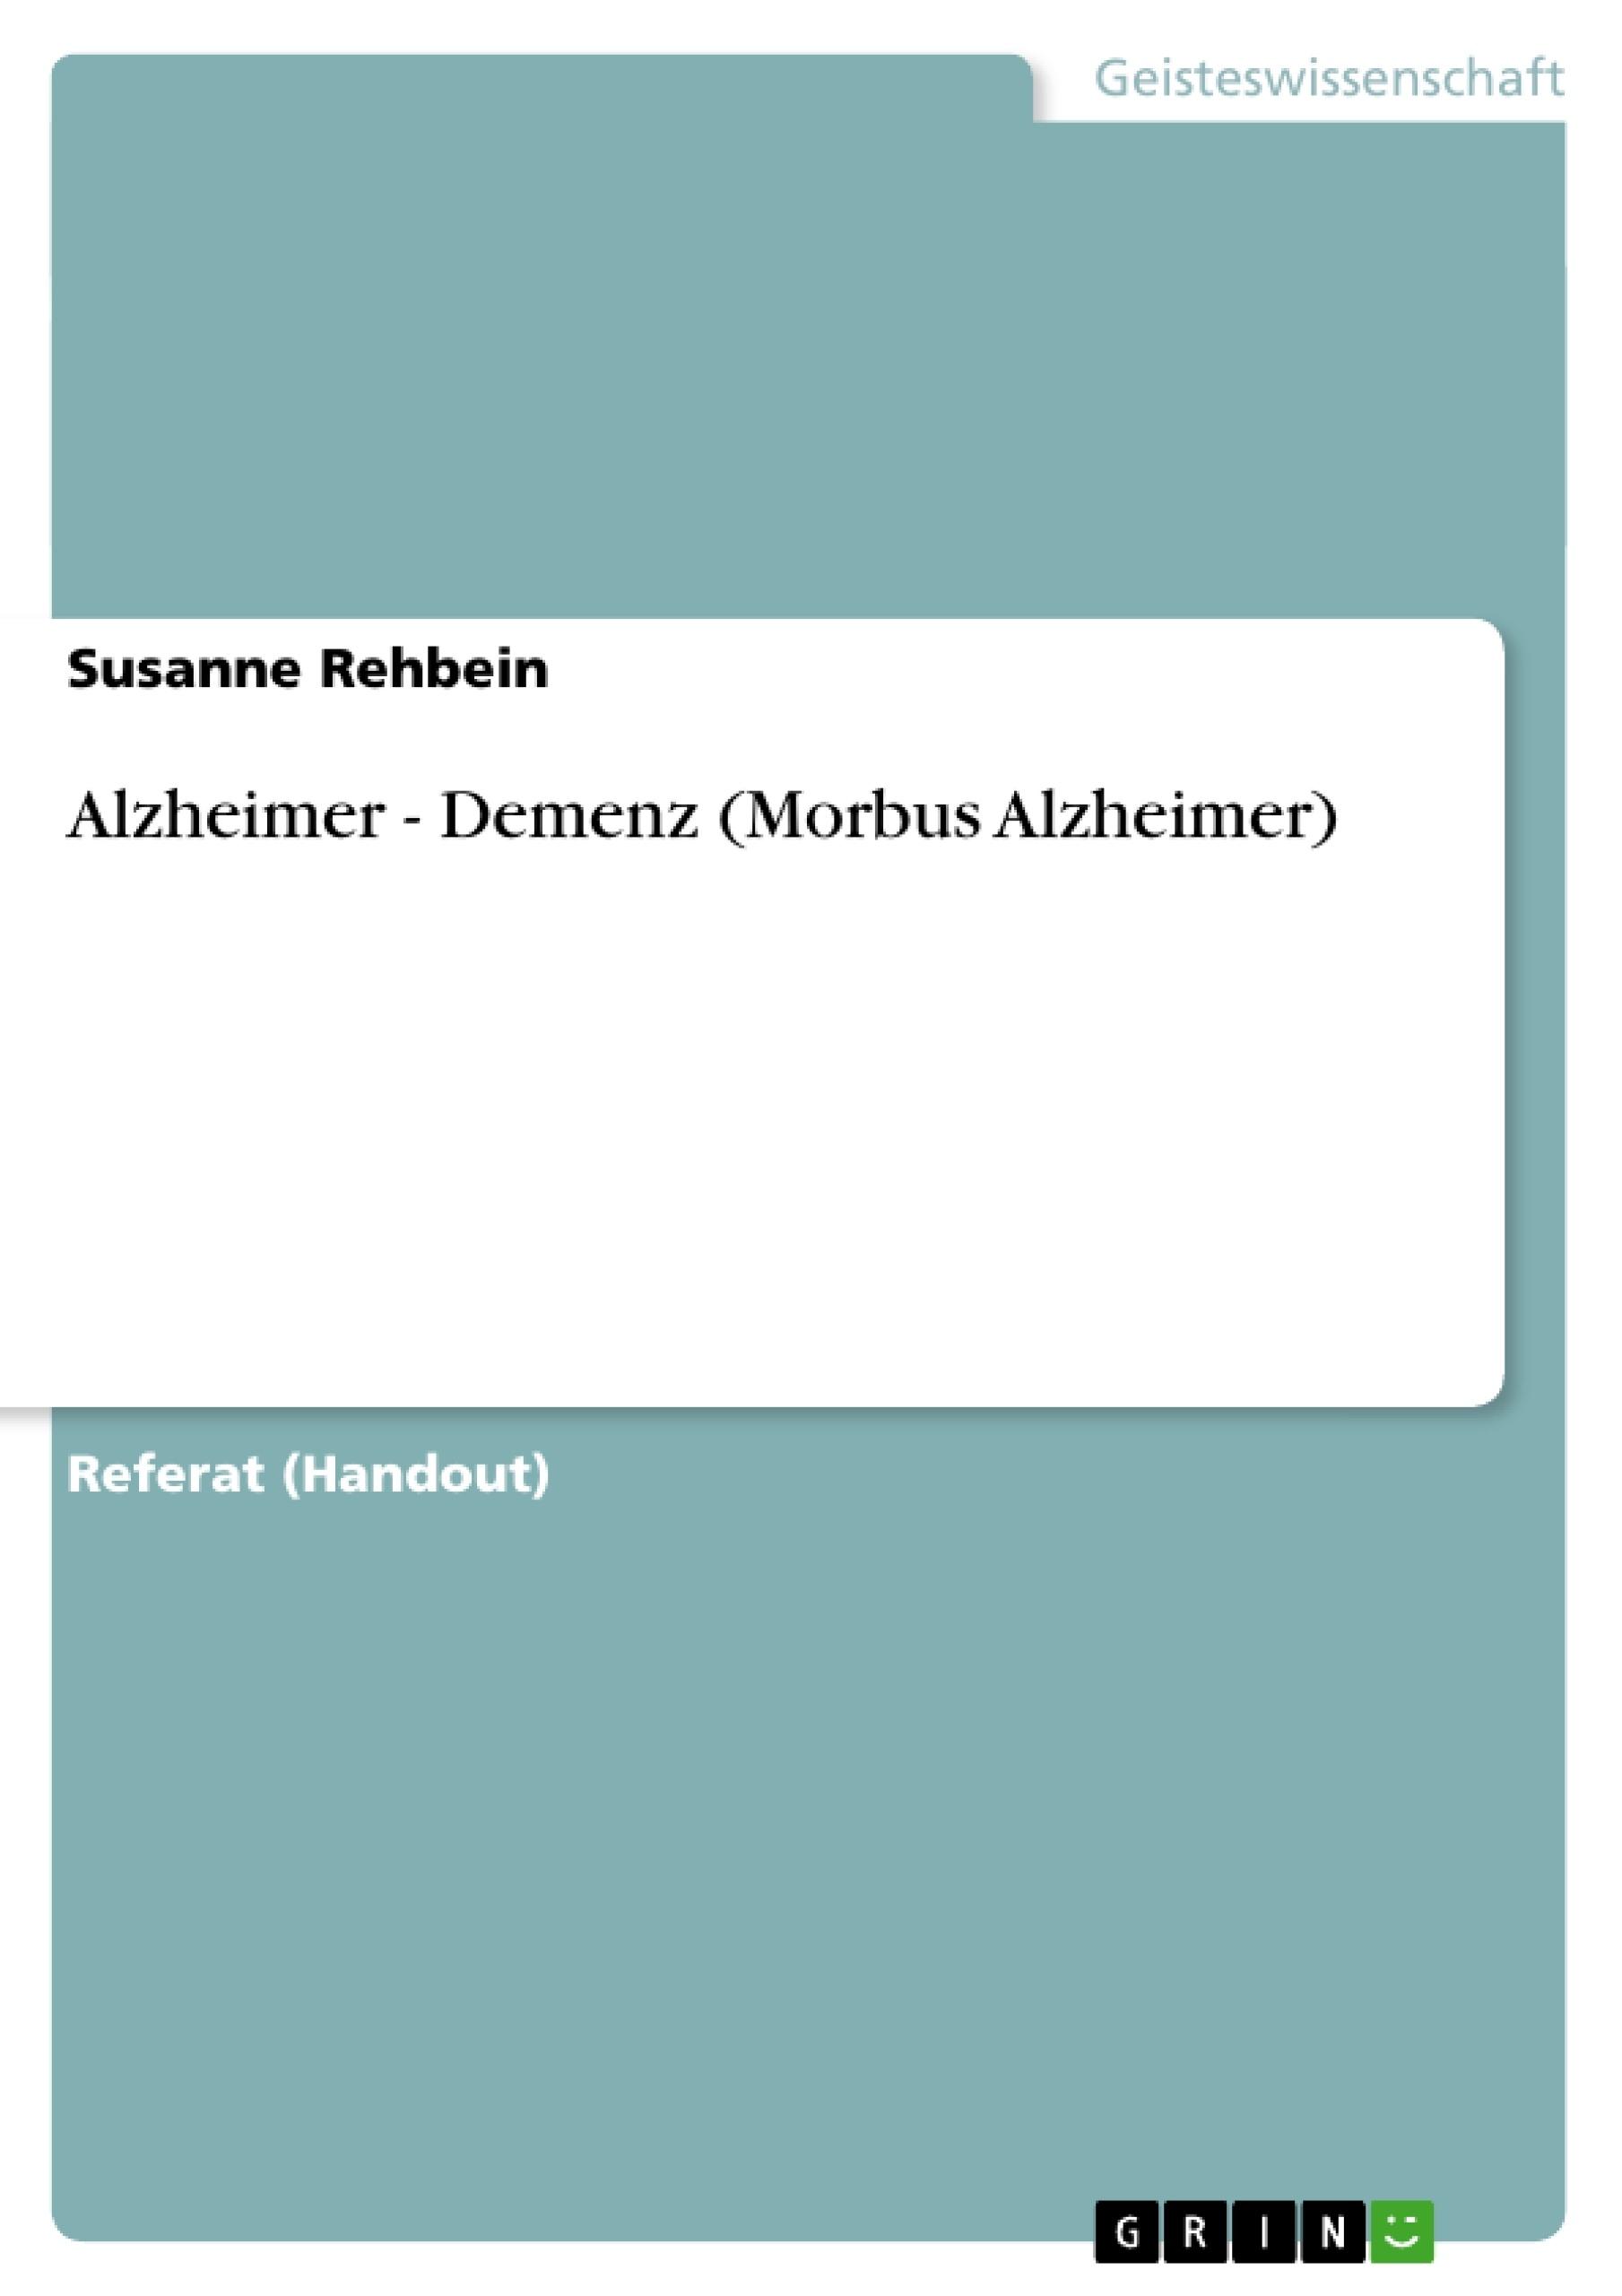 Titel: Alzheimer - Demenz (Morbus Alzheimer)